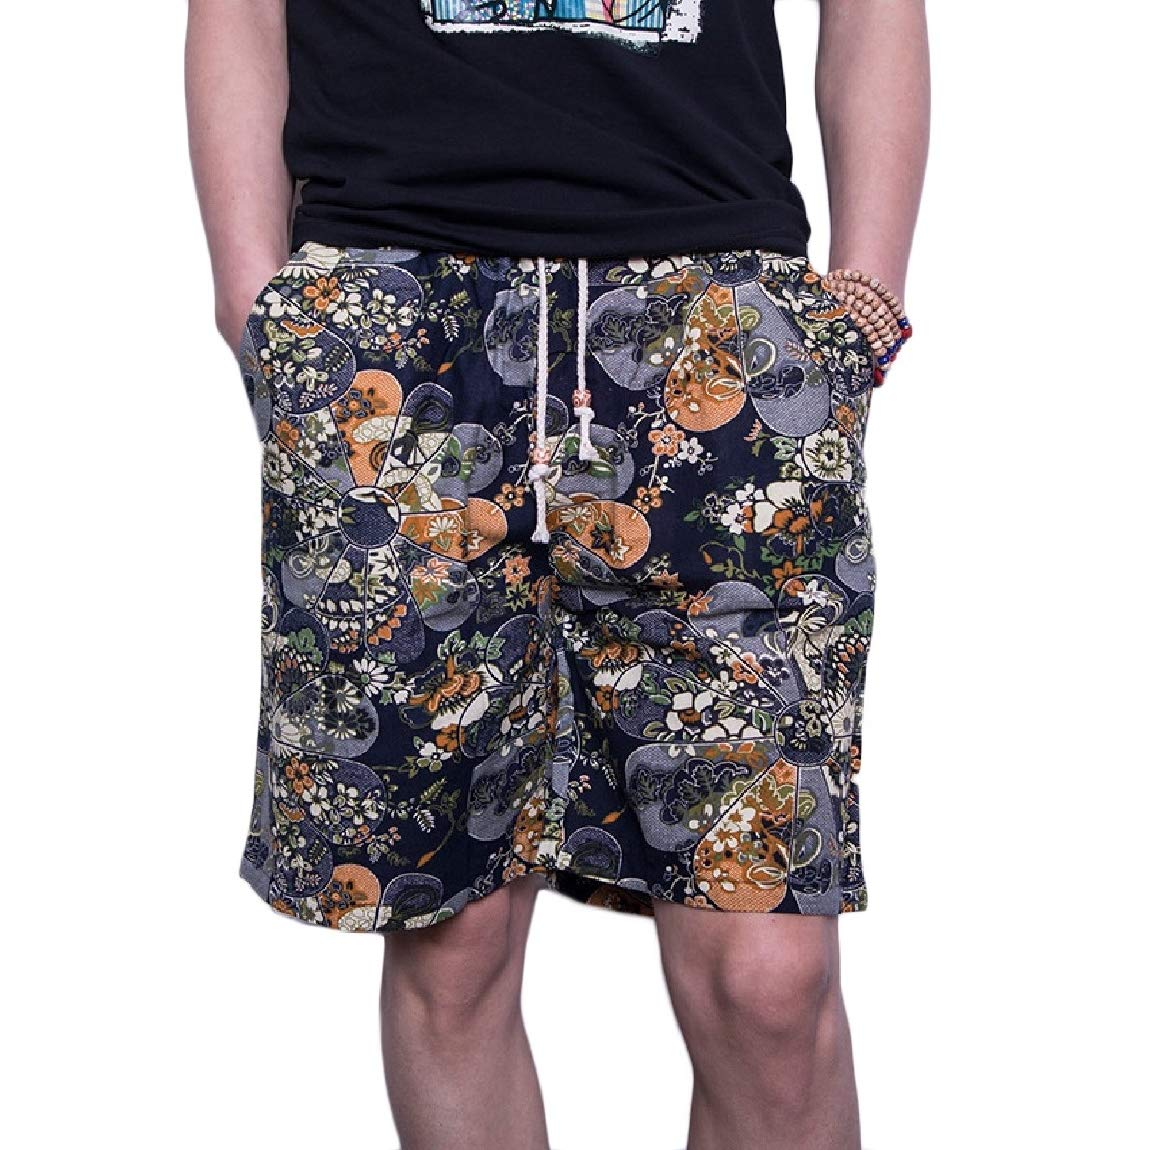 Mfasica Mens Quick Dry Linen Floral Spring Oversize Beach Shorts